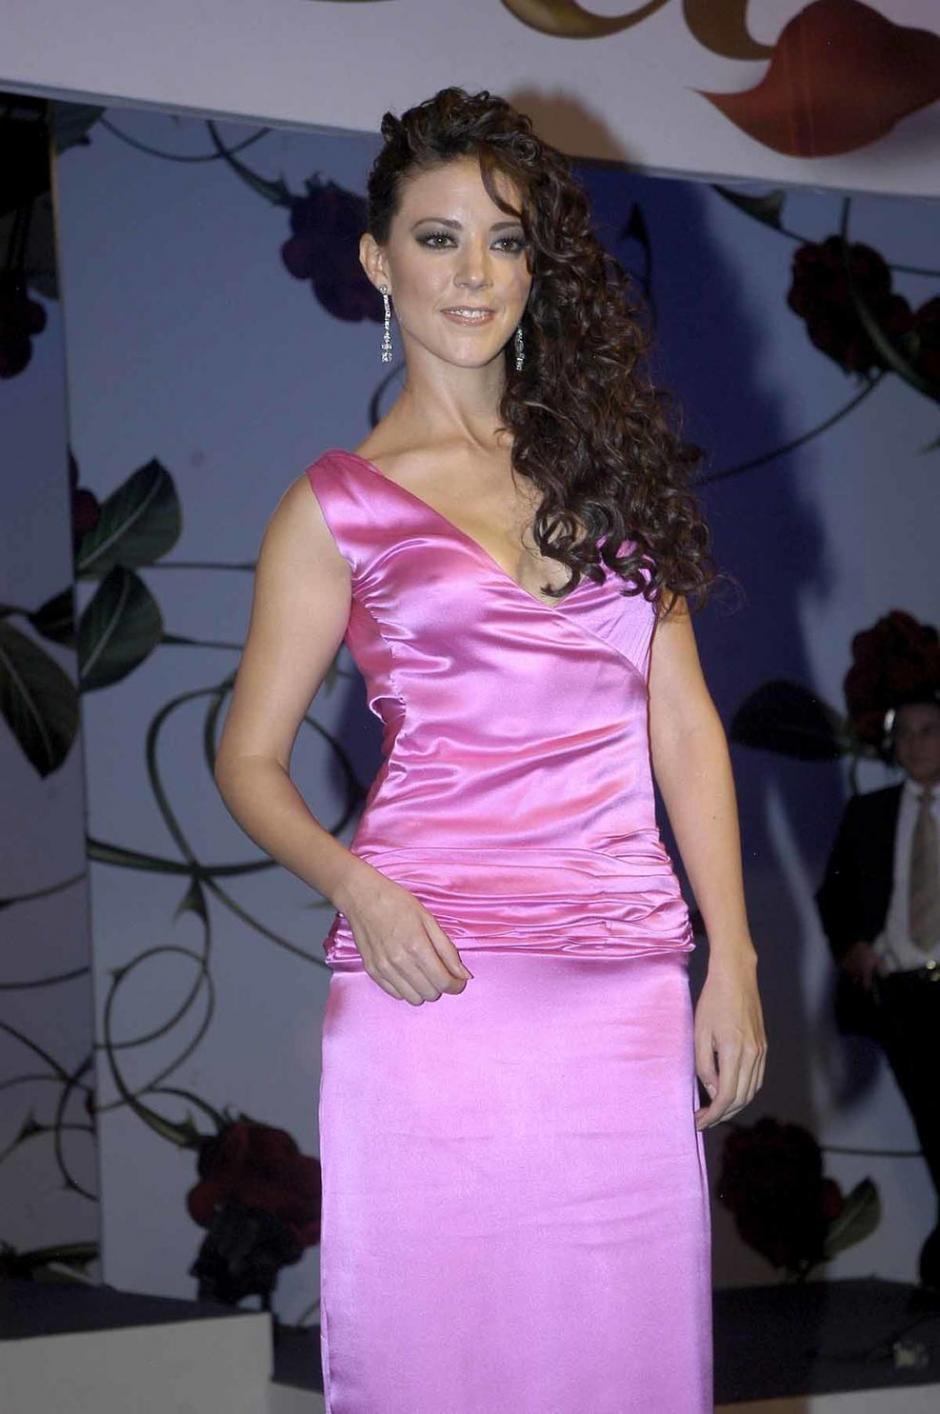 En 2011 formó parte de la telenovela Teresa. (Foto: Telemundo)